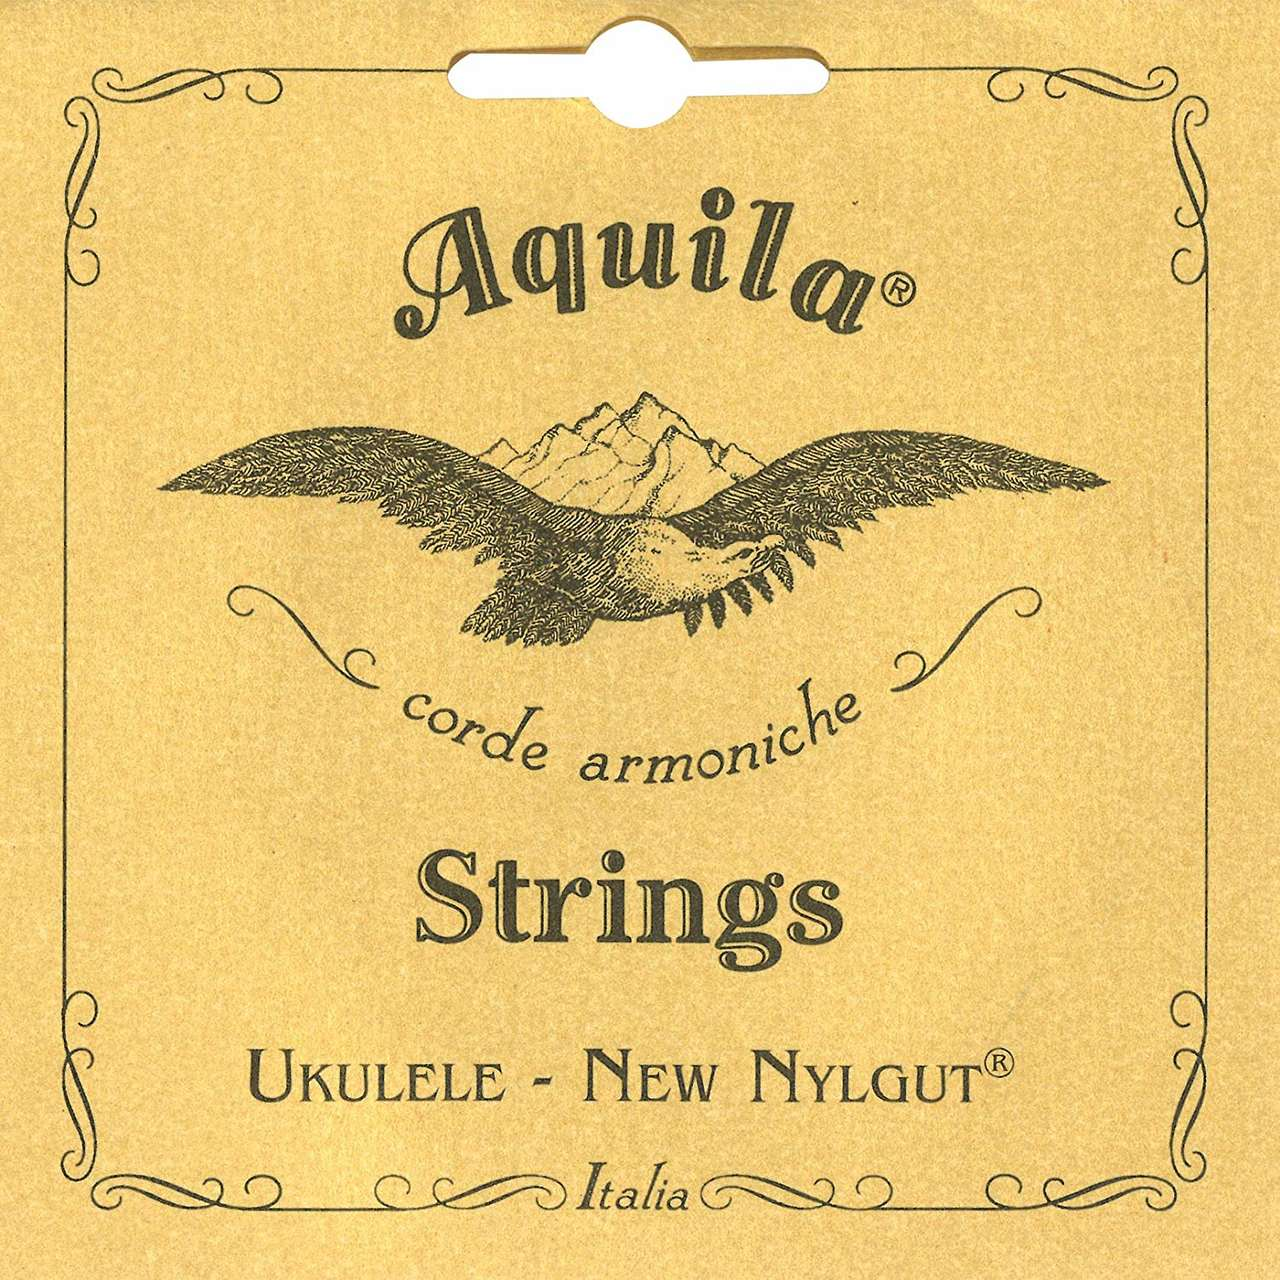 Encordoamento Aquila 8U New Nylgut Low G Ukulele Concert